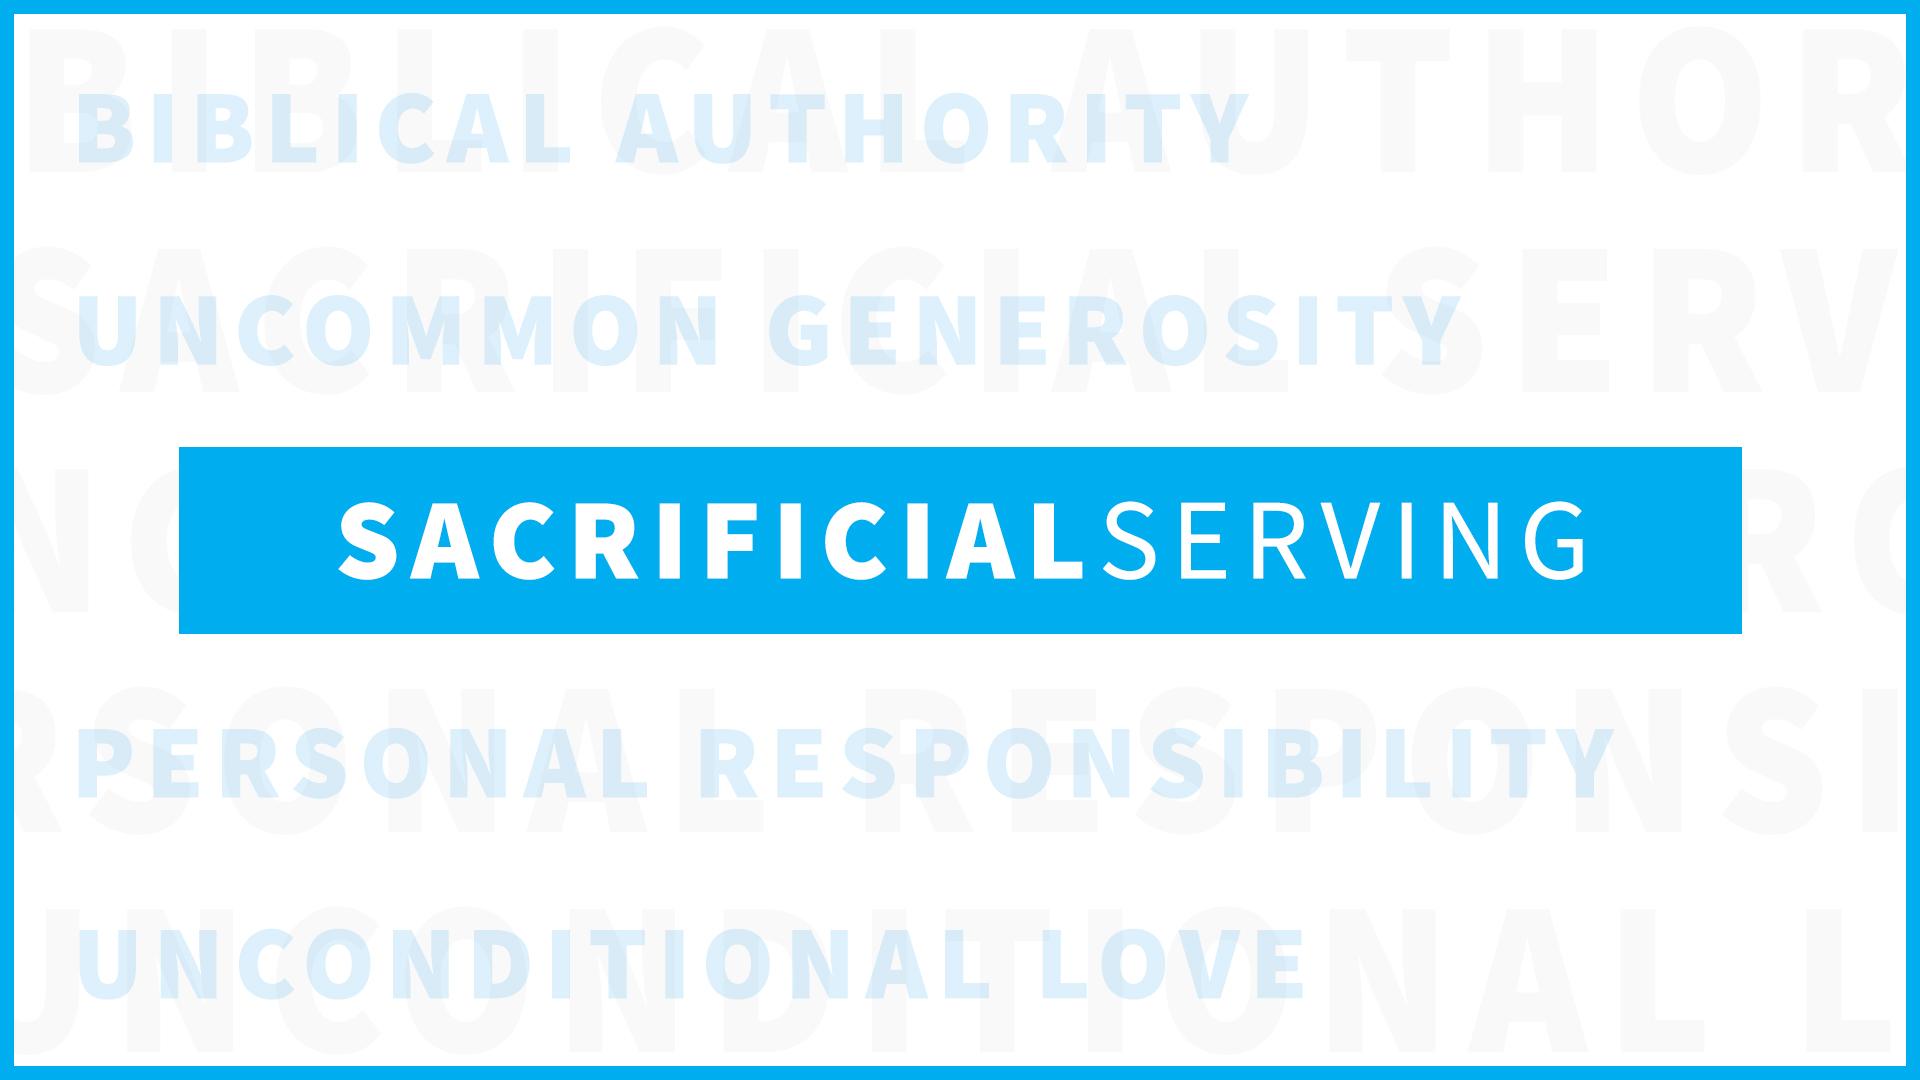 Sacrifical Serving_1920x1080_Alt.jpg